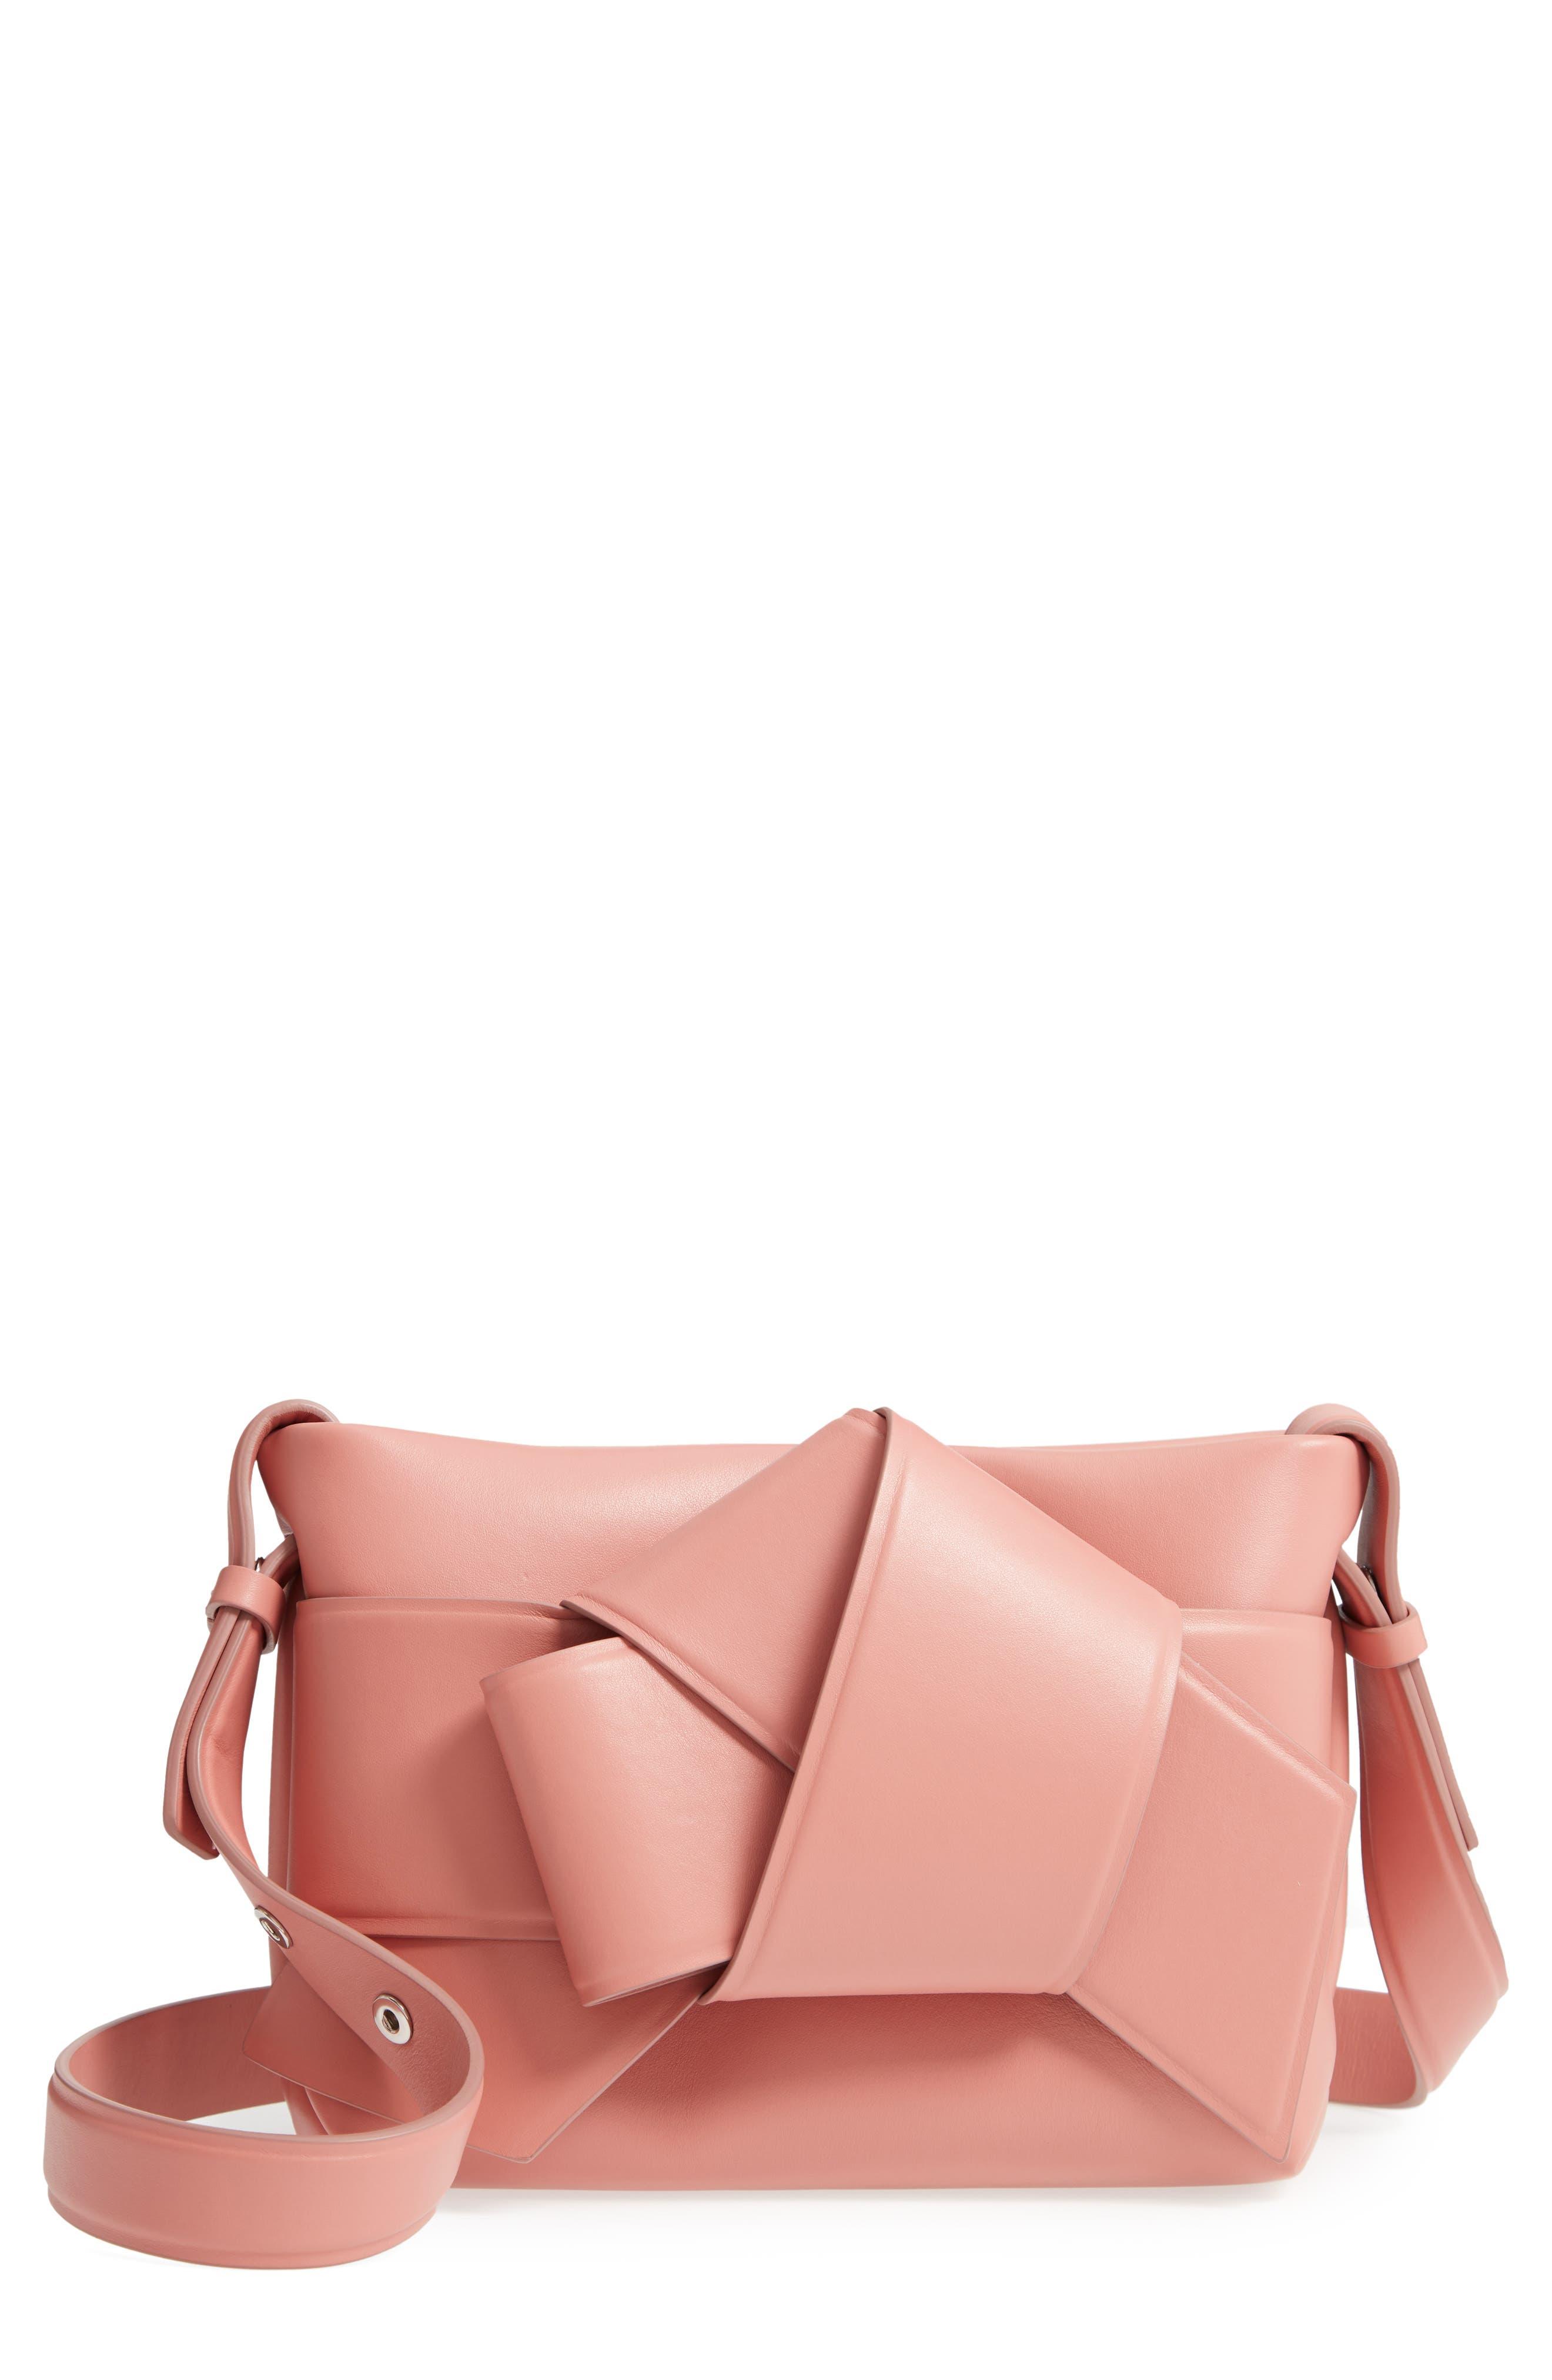 Musubi Knot Leather Handbag,                             Main thumbnail 1, color,                             PINK